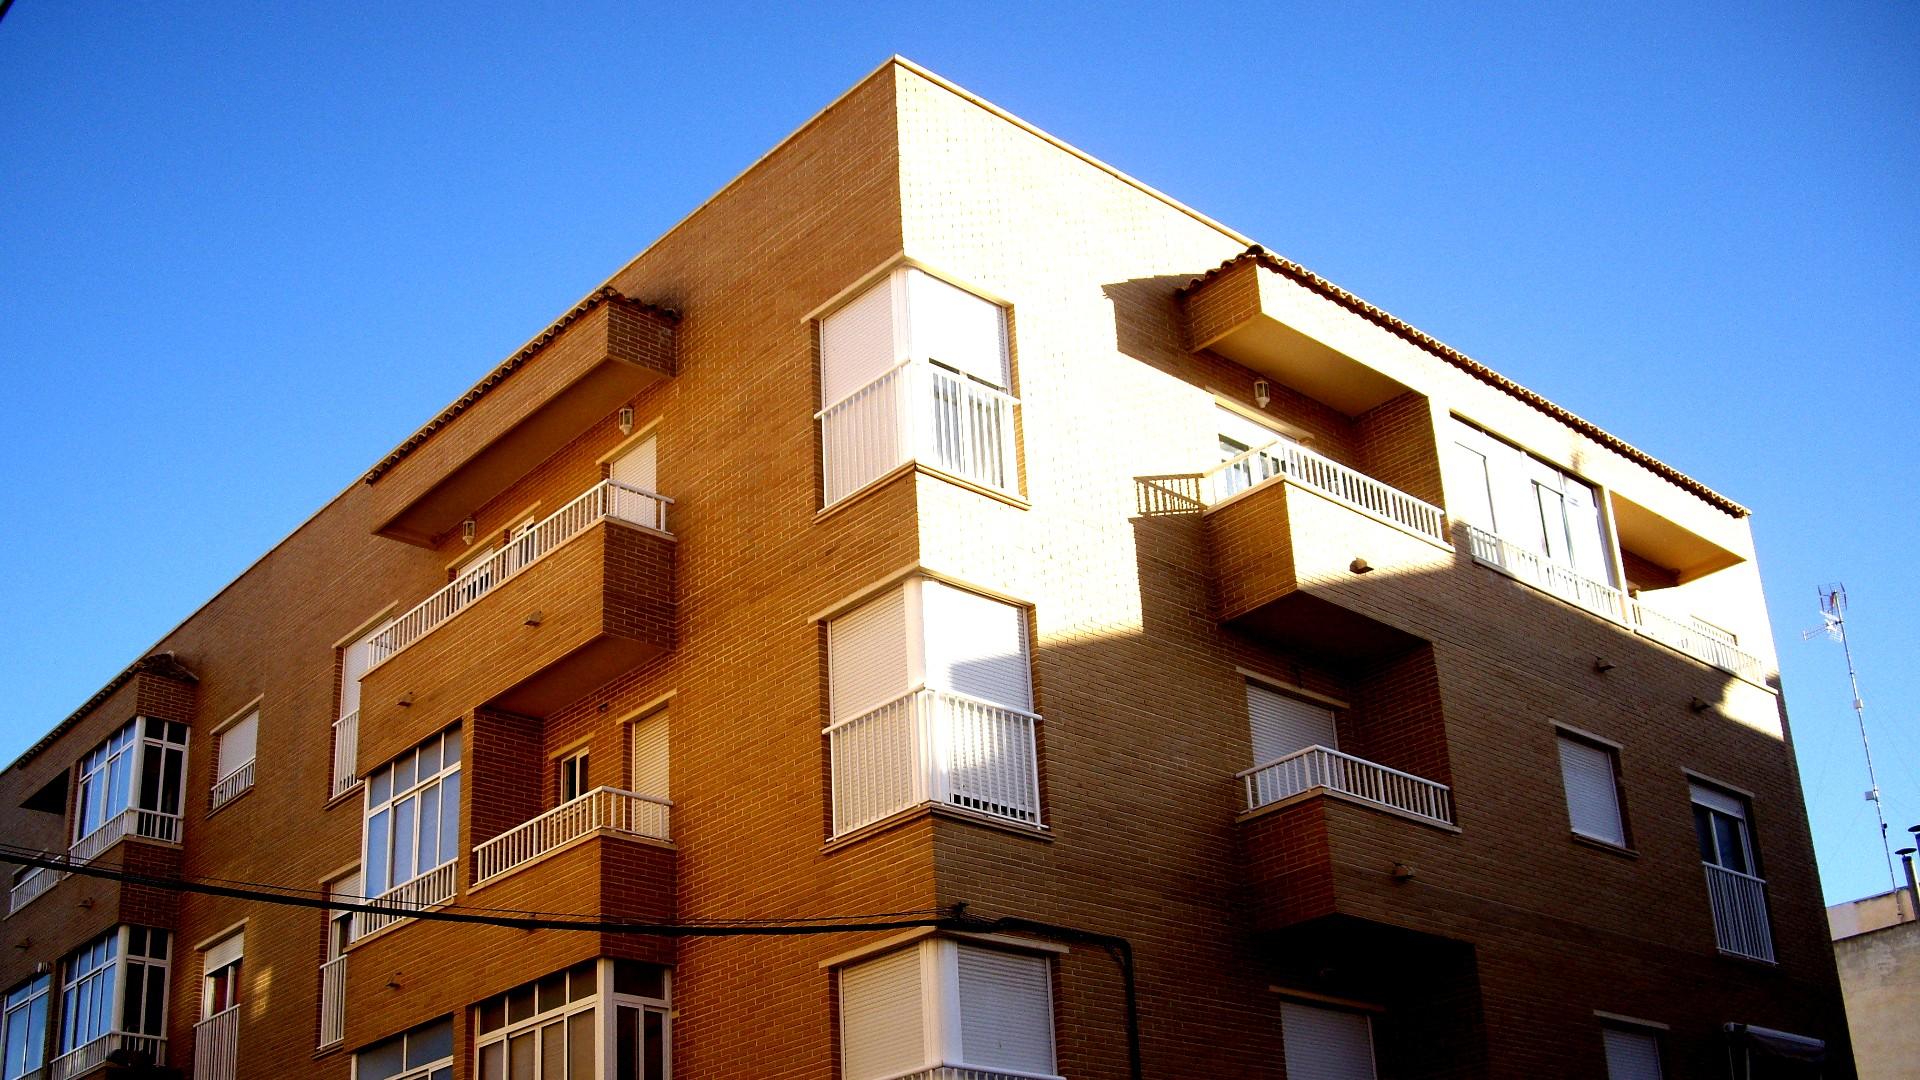 Estudio de arquitectos Vicente Agulló